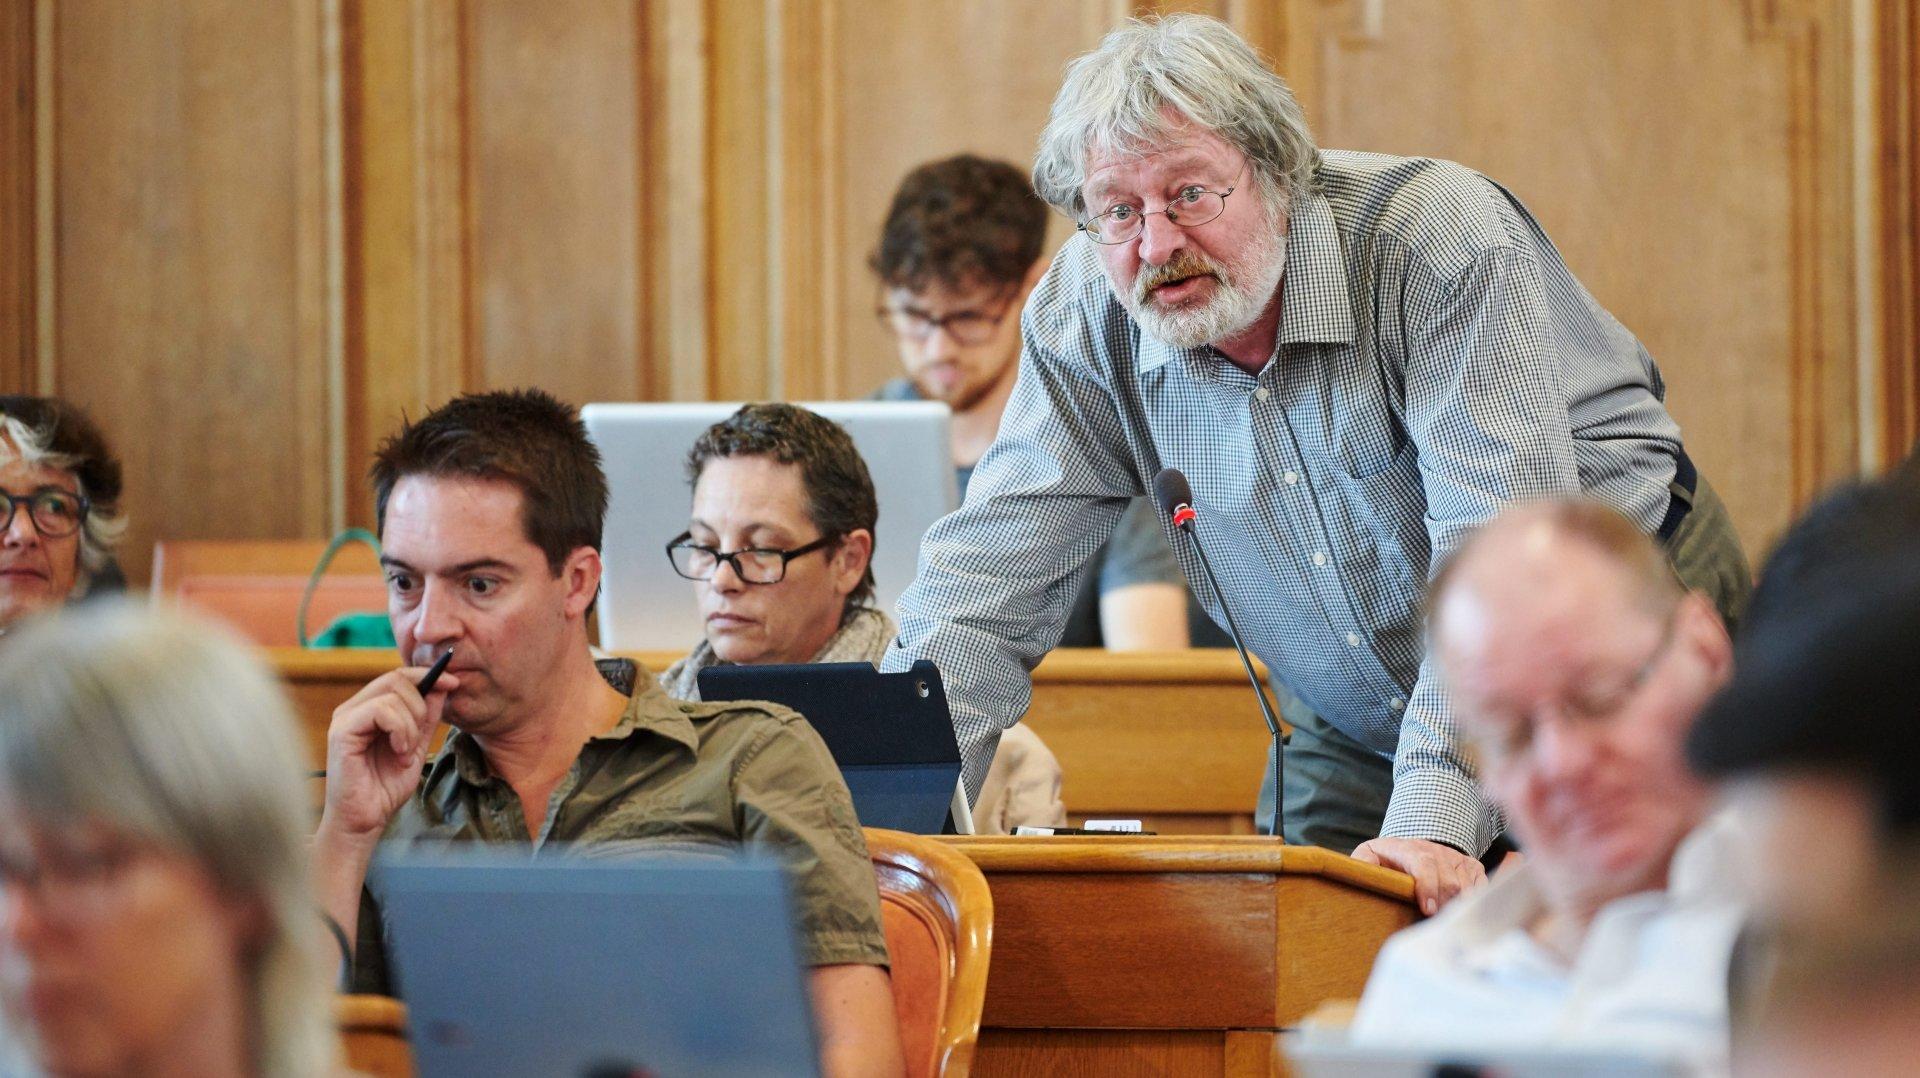 Ténor du Grand Conseil neuchâtelois, Daniel Ziegler bat en retraite